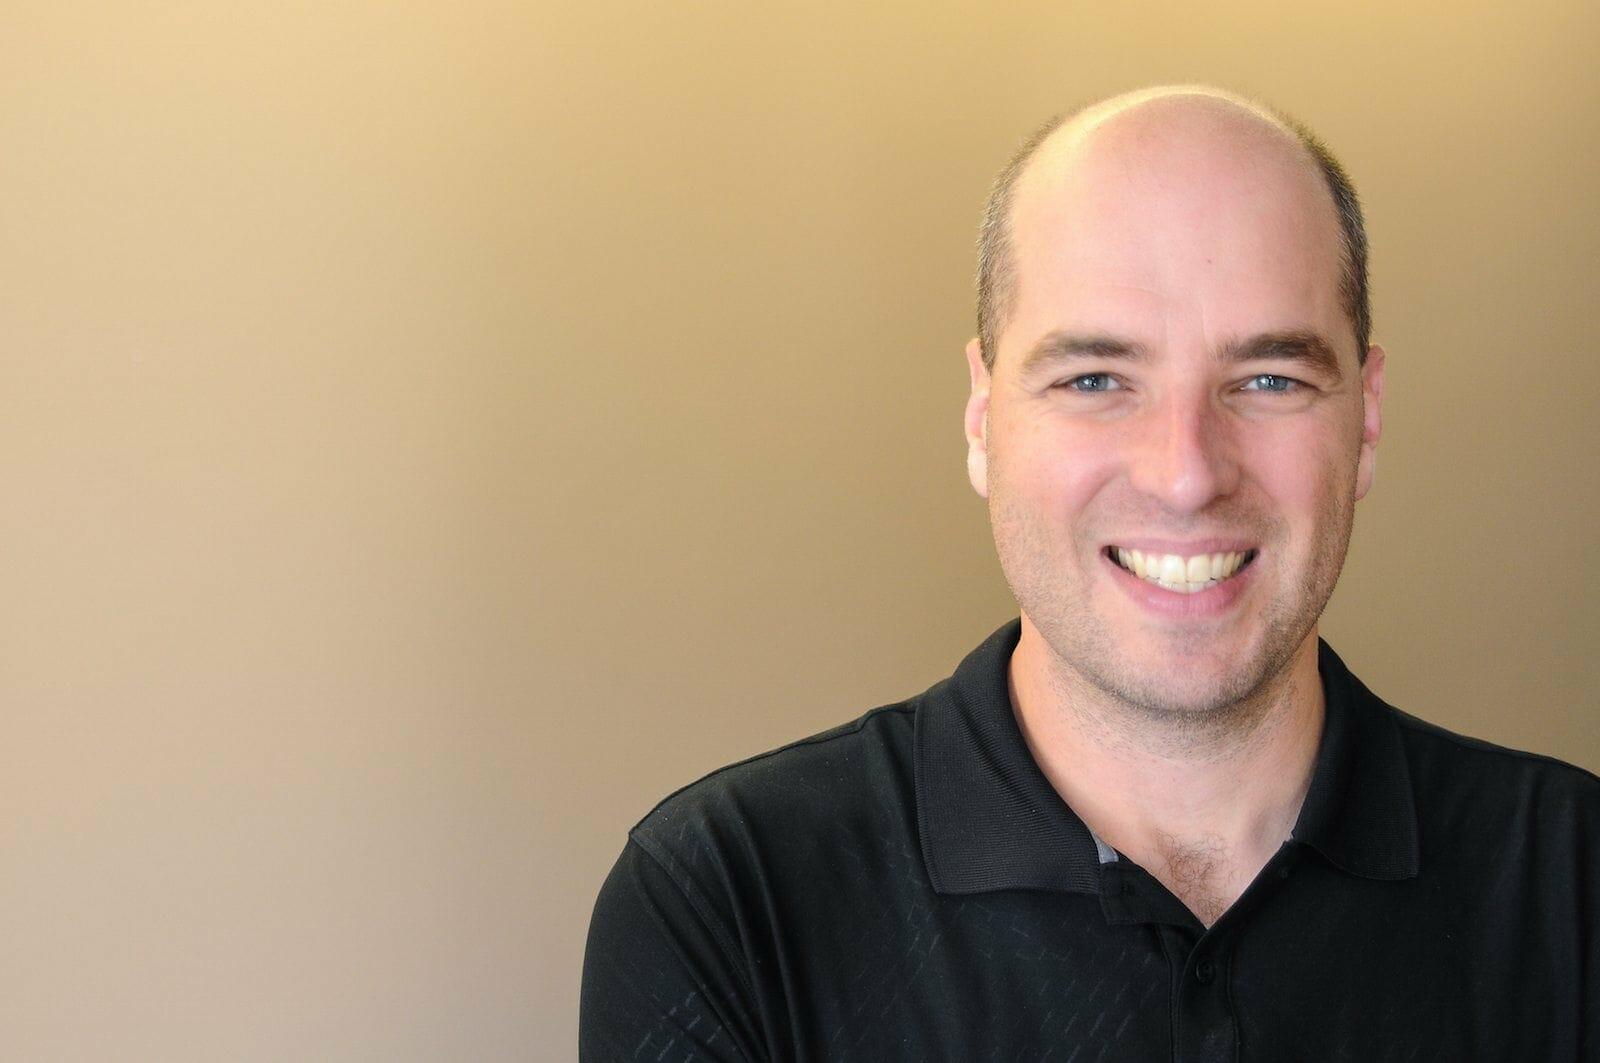 Russ Fradin - Co-founder of Dynamic Signal